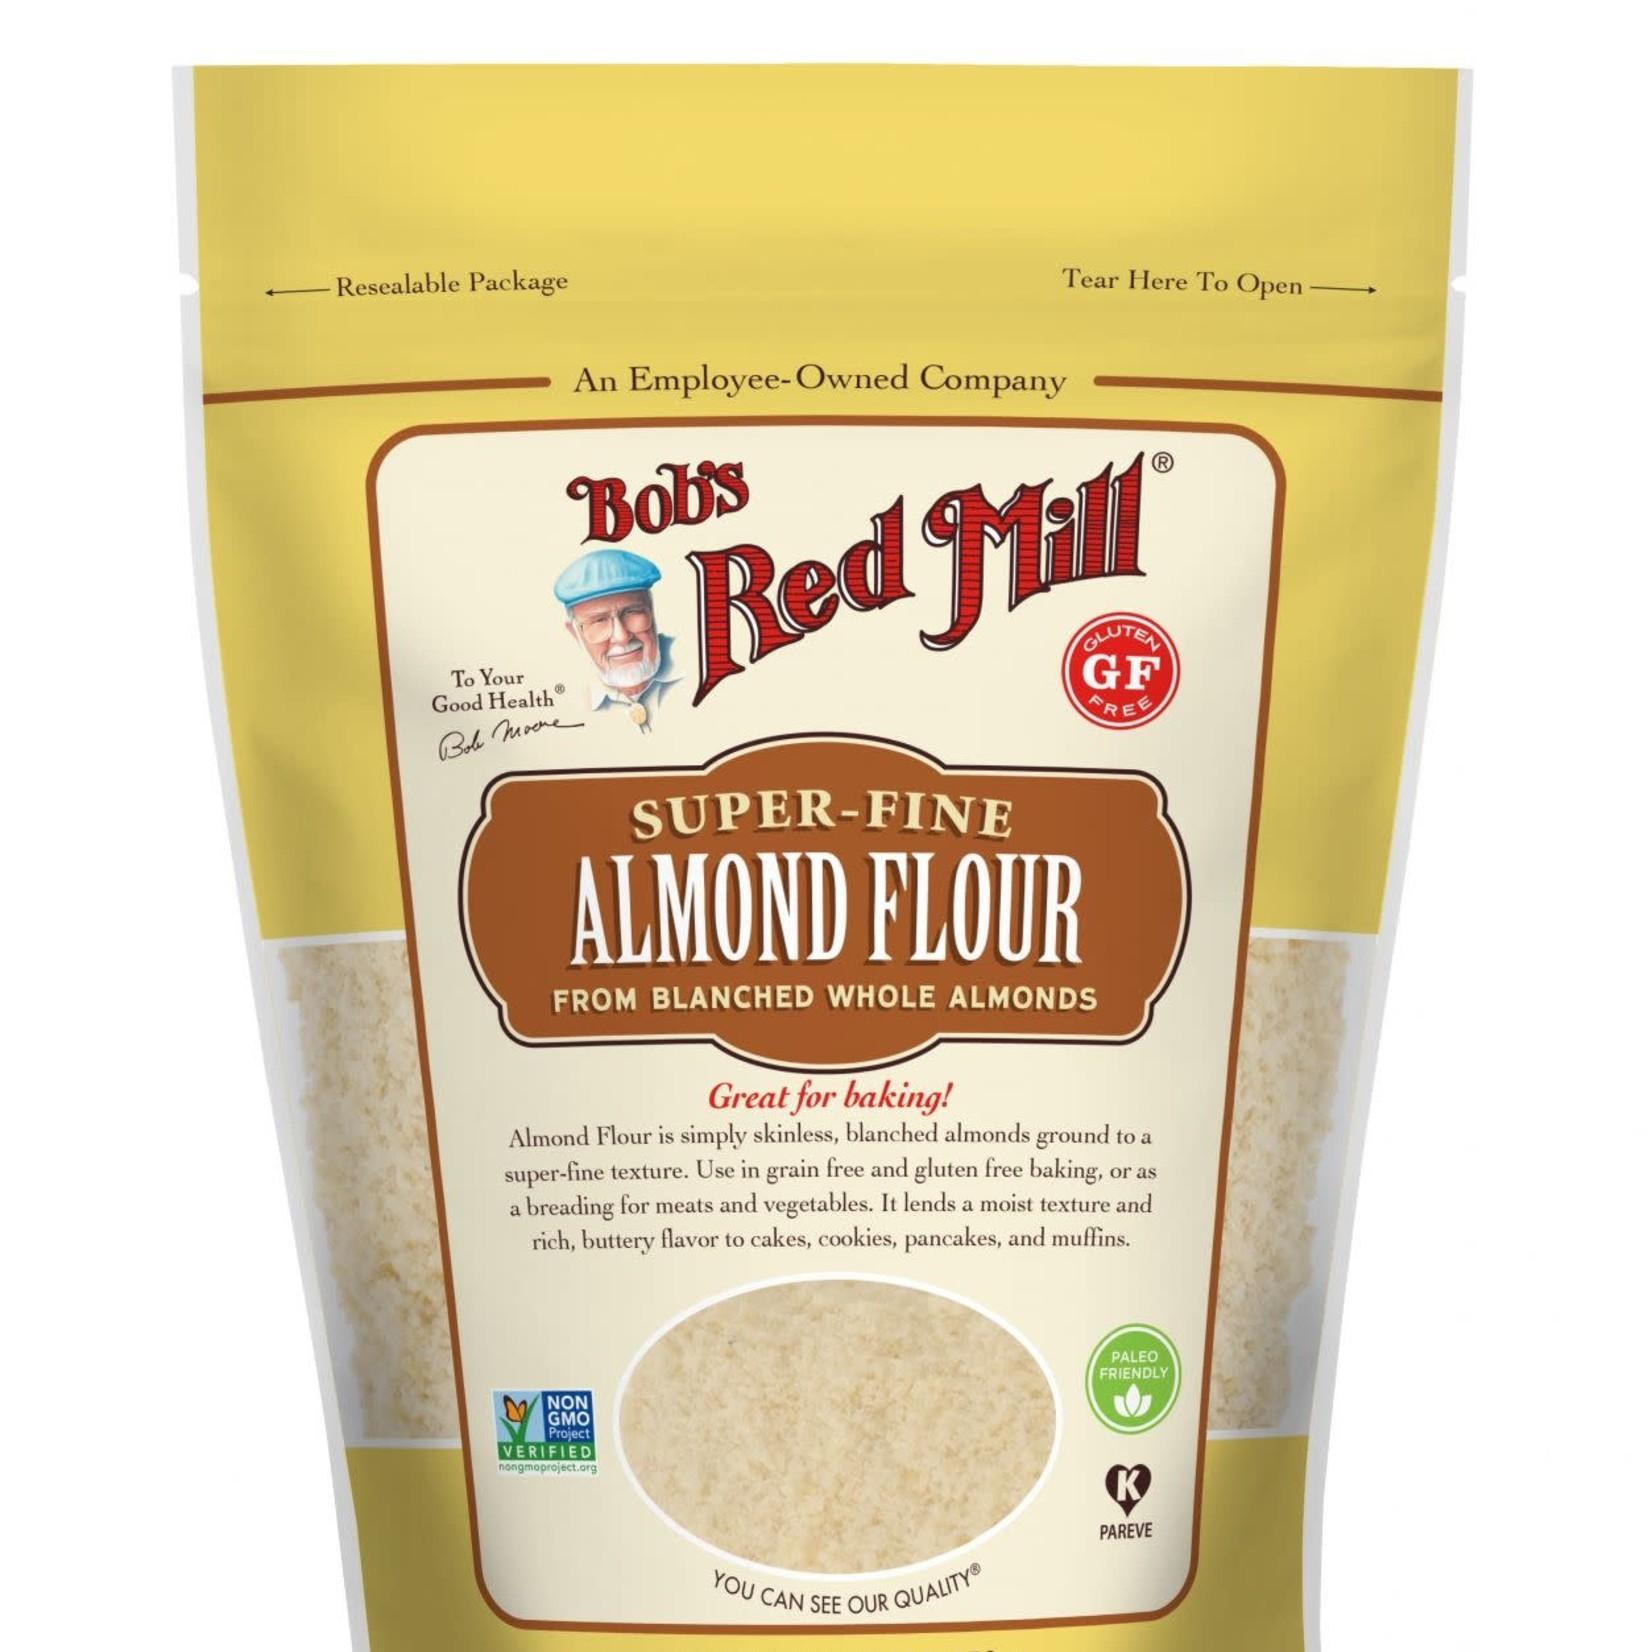 Bob's Red Mill Bob's Red Mill Almond Flour 453g